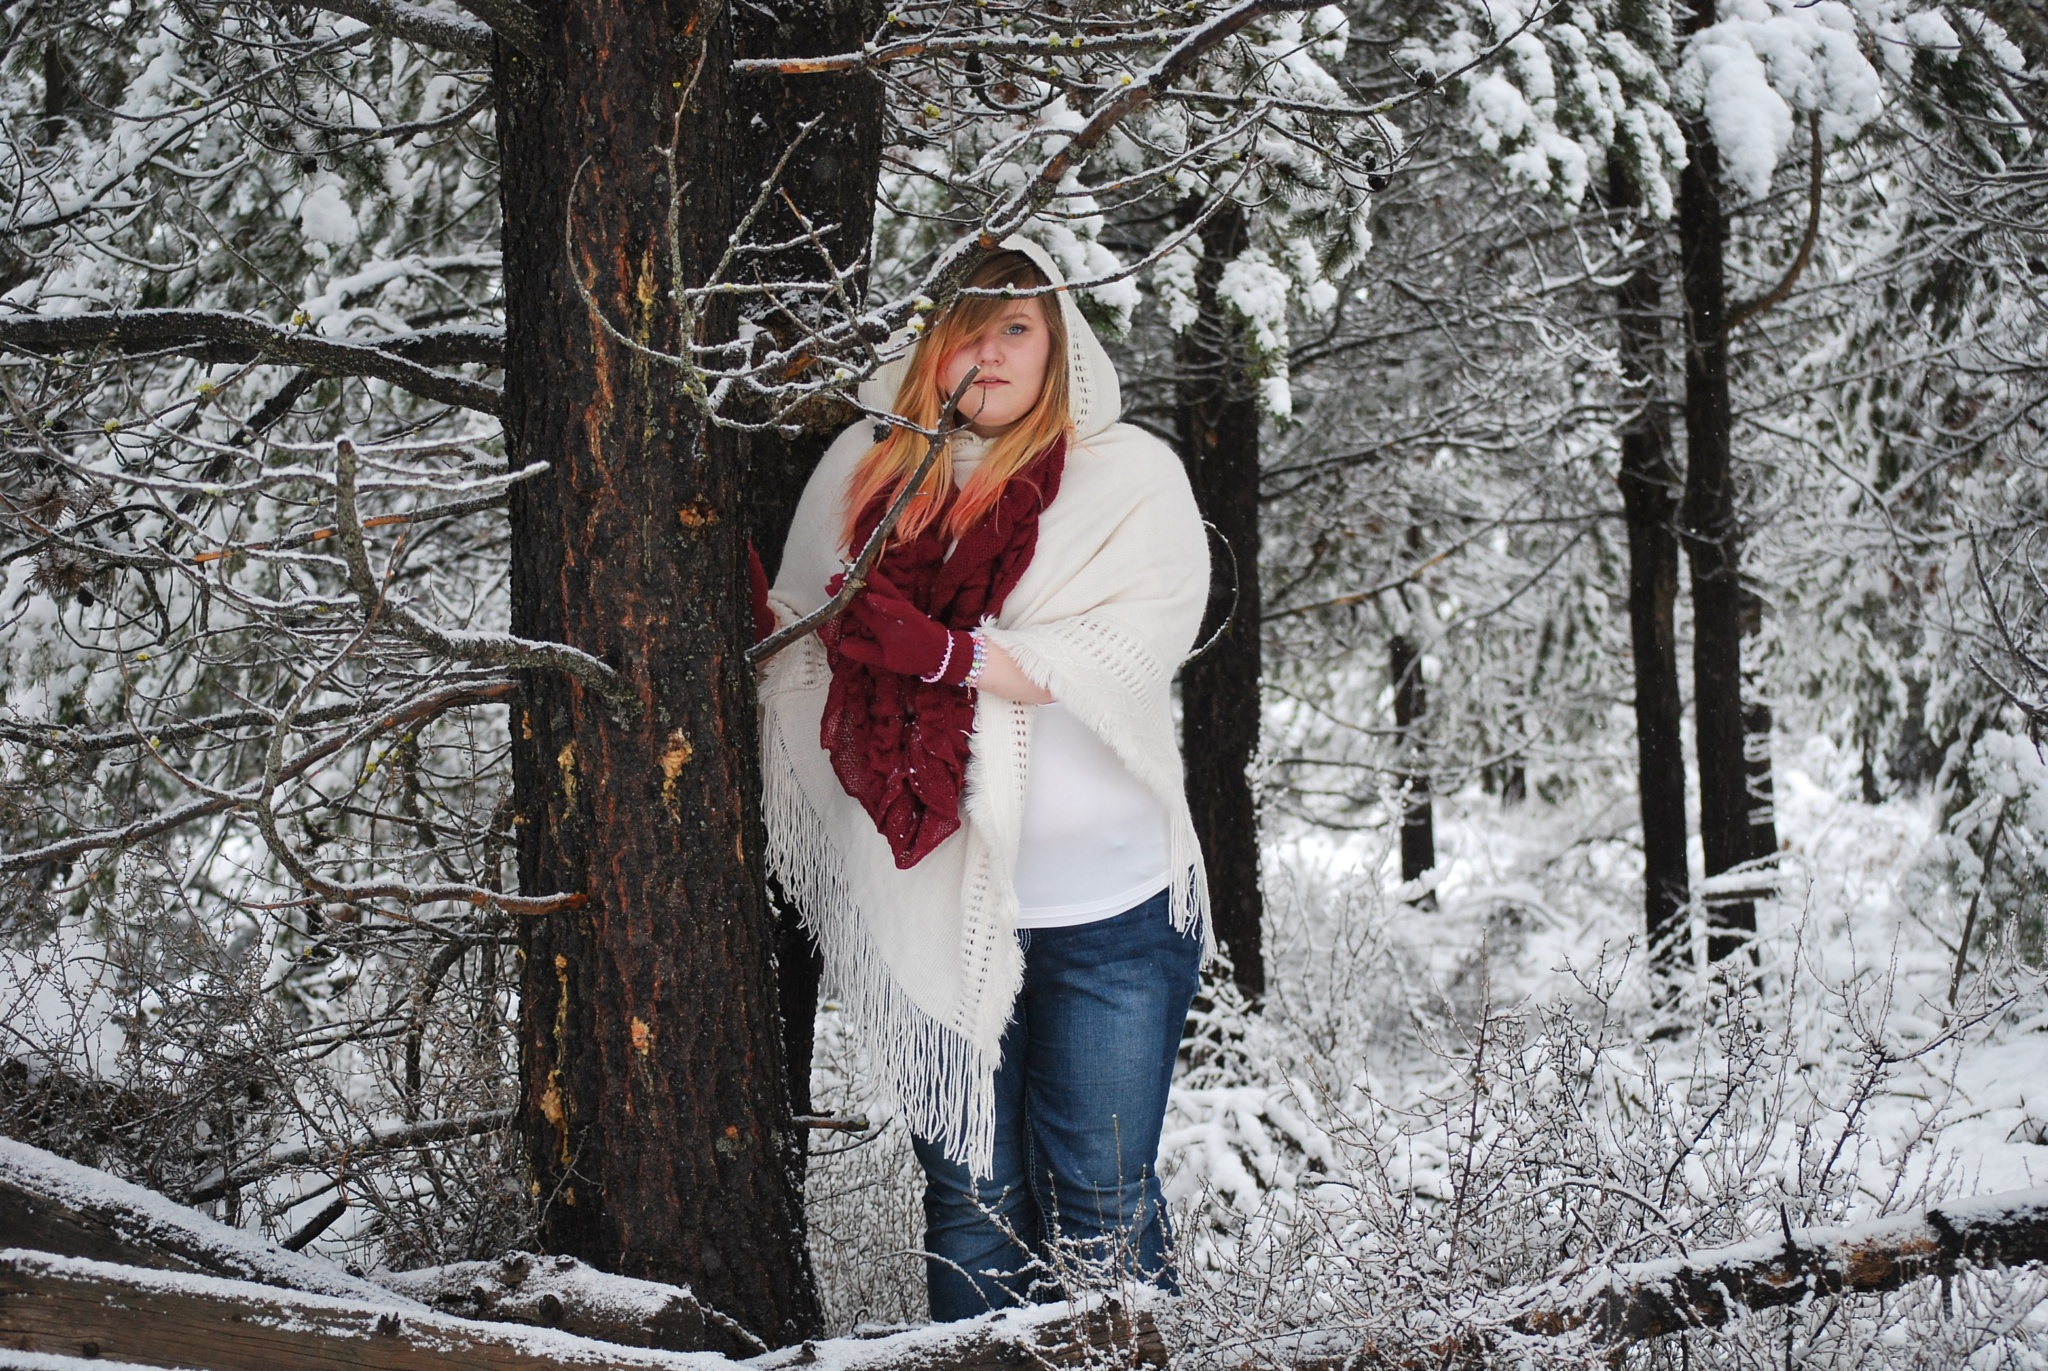 Snow all around by marilyn wirtz